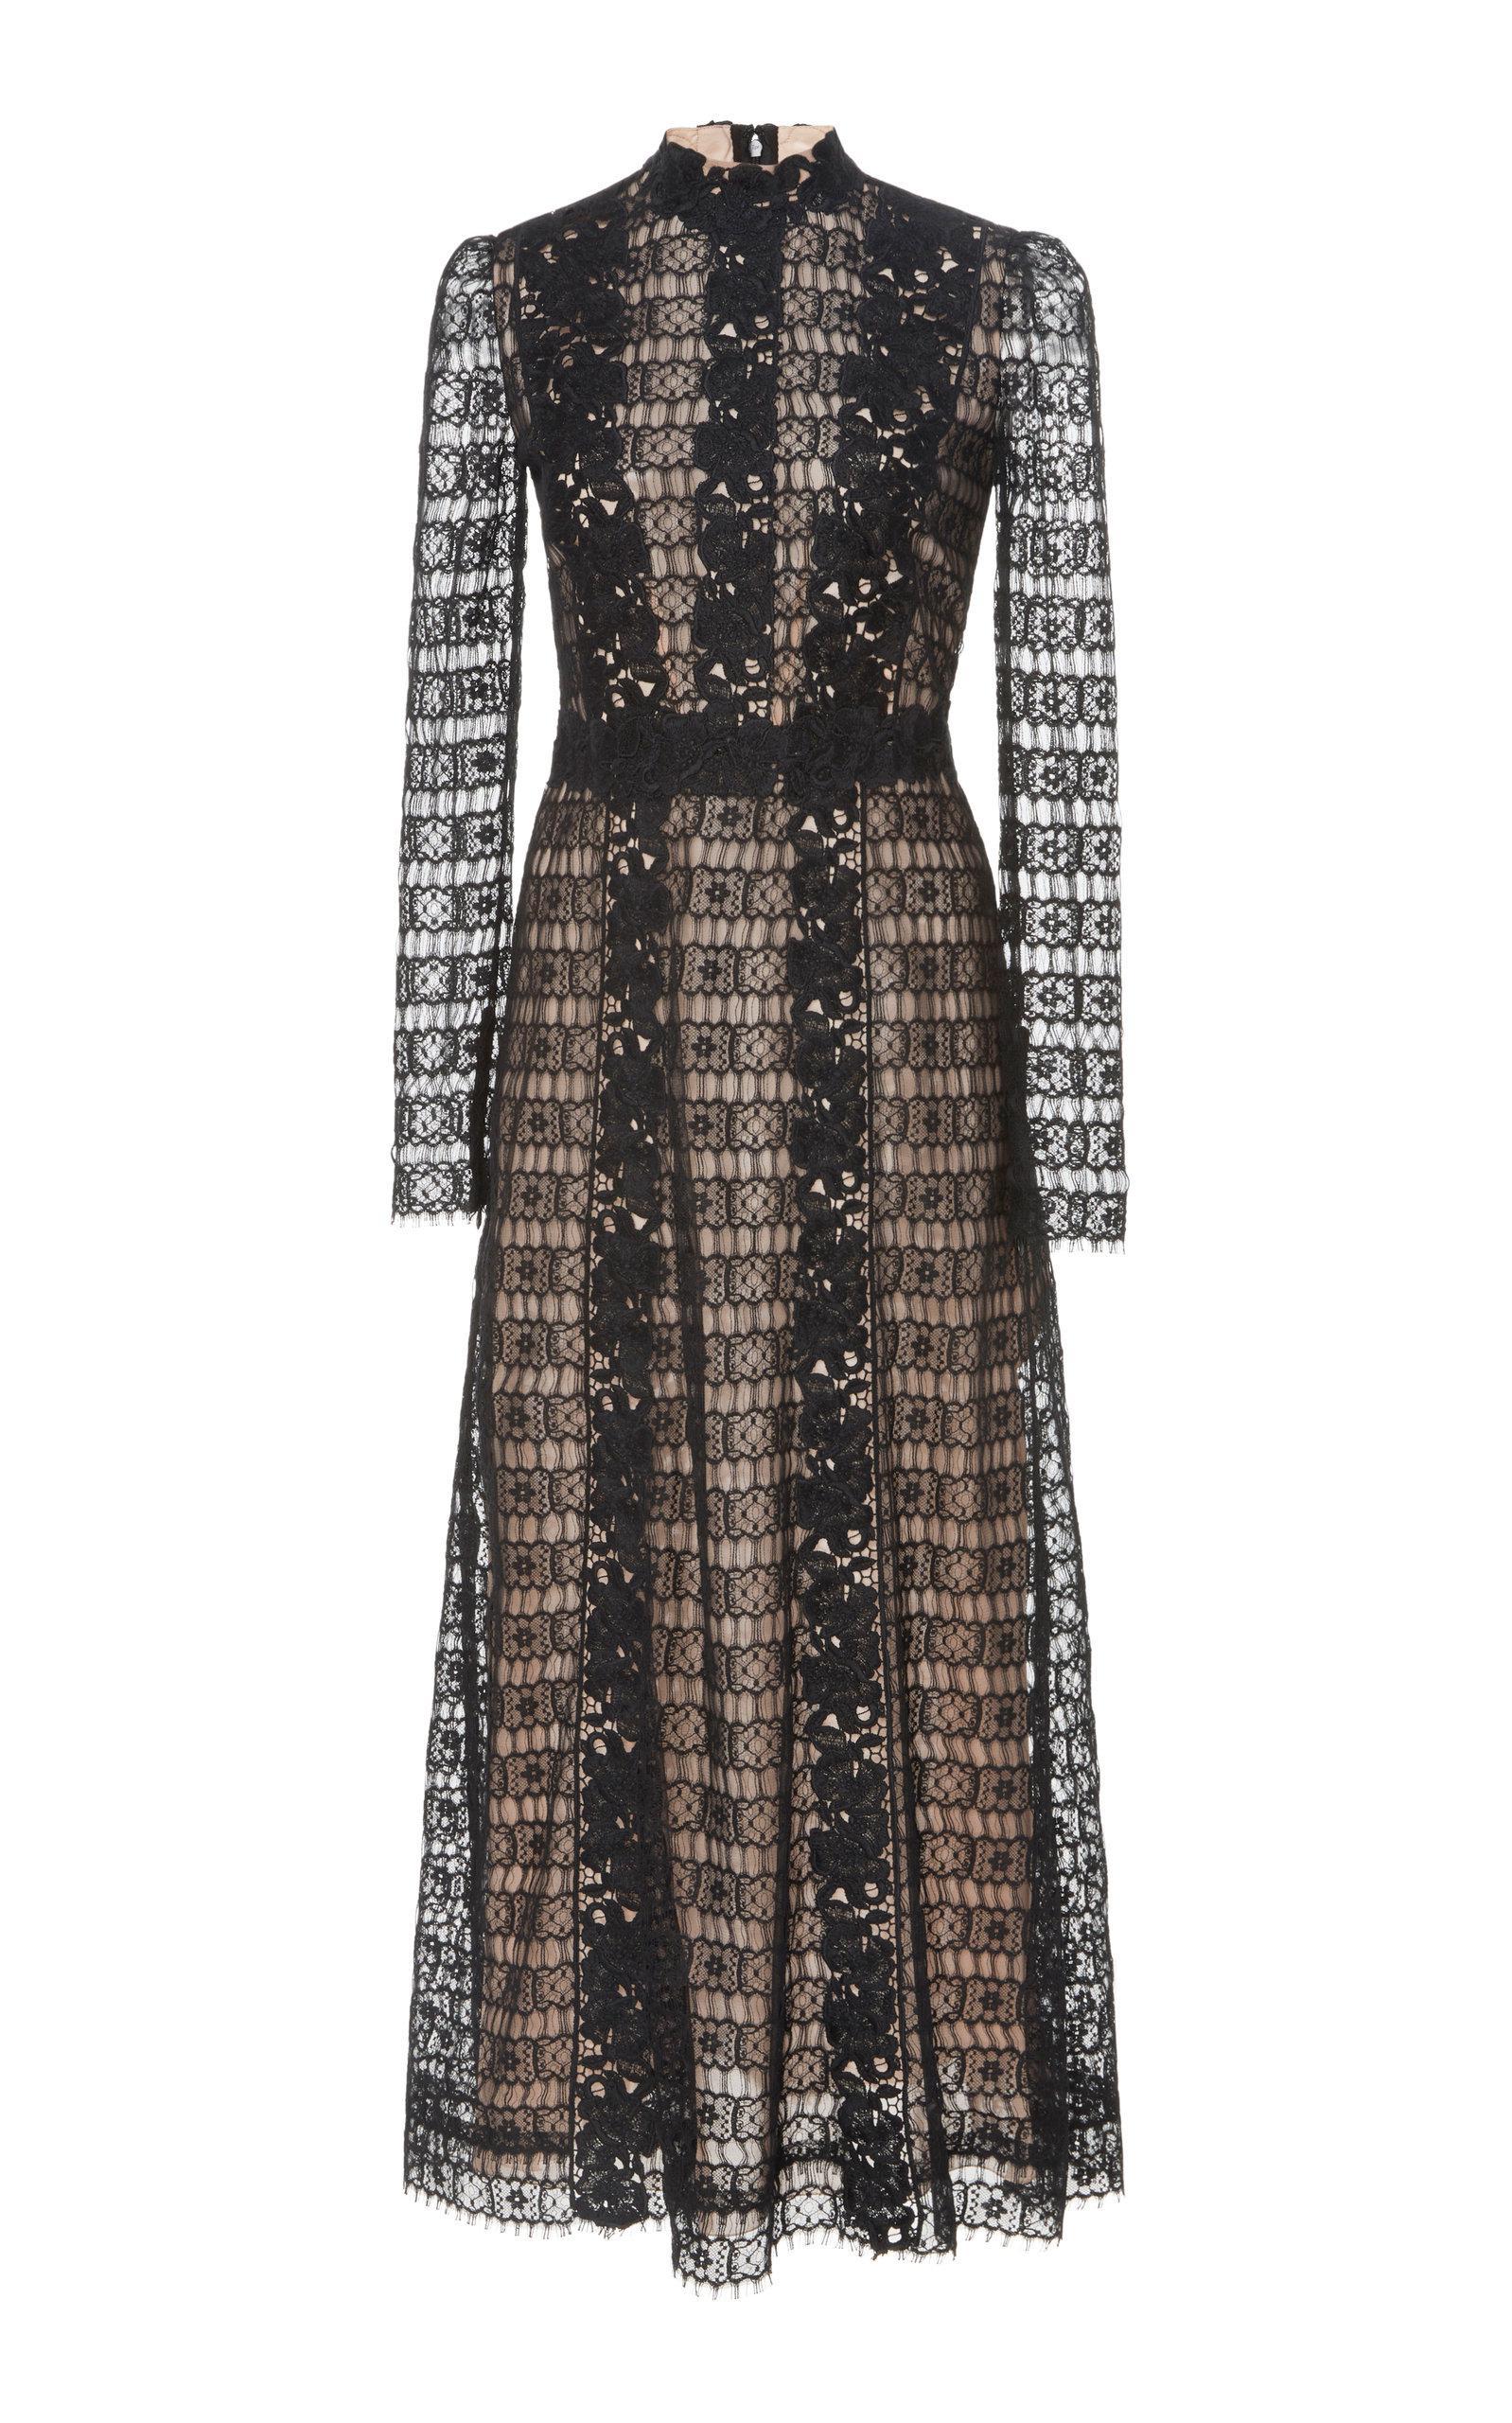 9e93698938 Lyst - Giambattista Valli Long Sleeve Midi Dress in Black